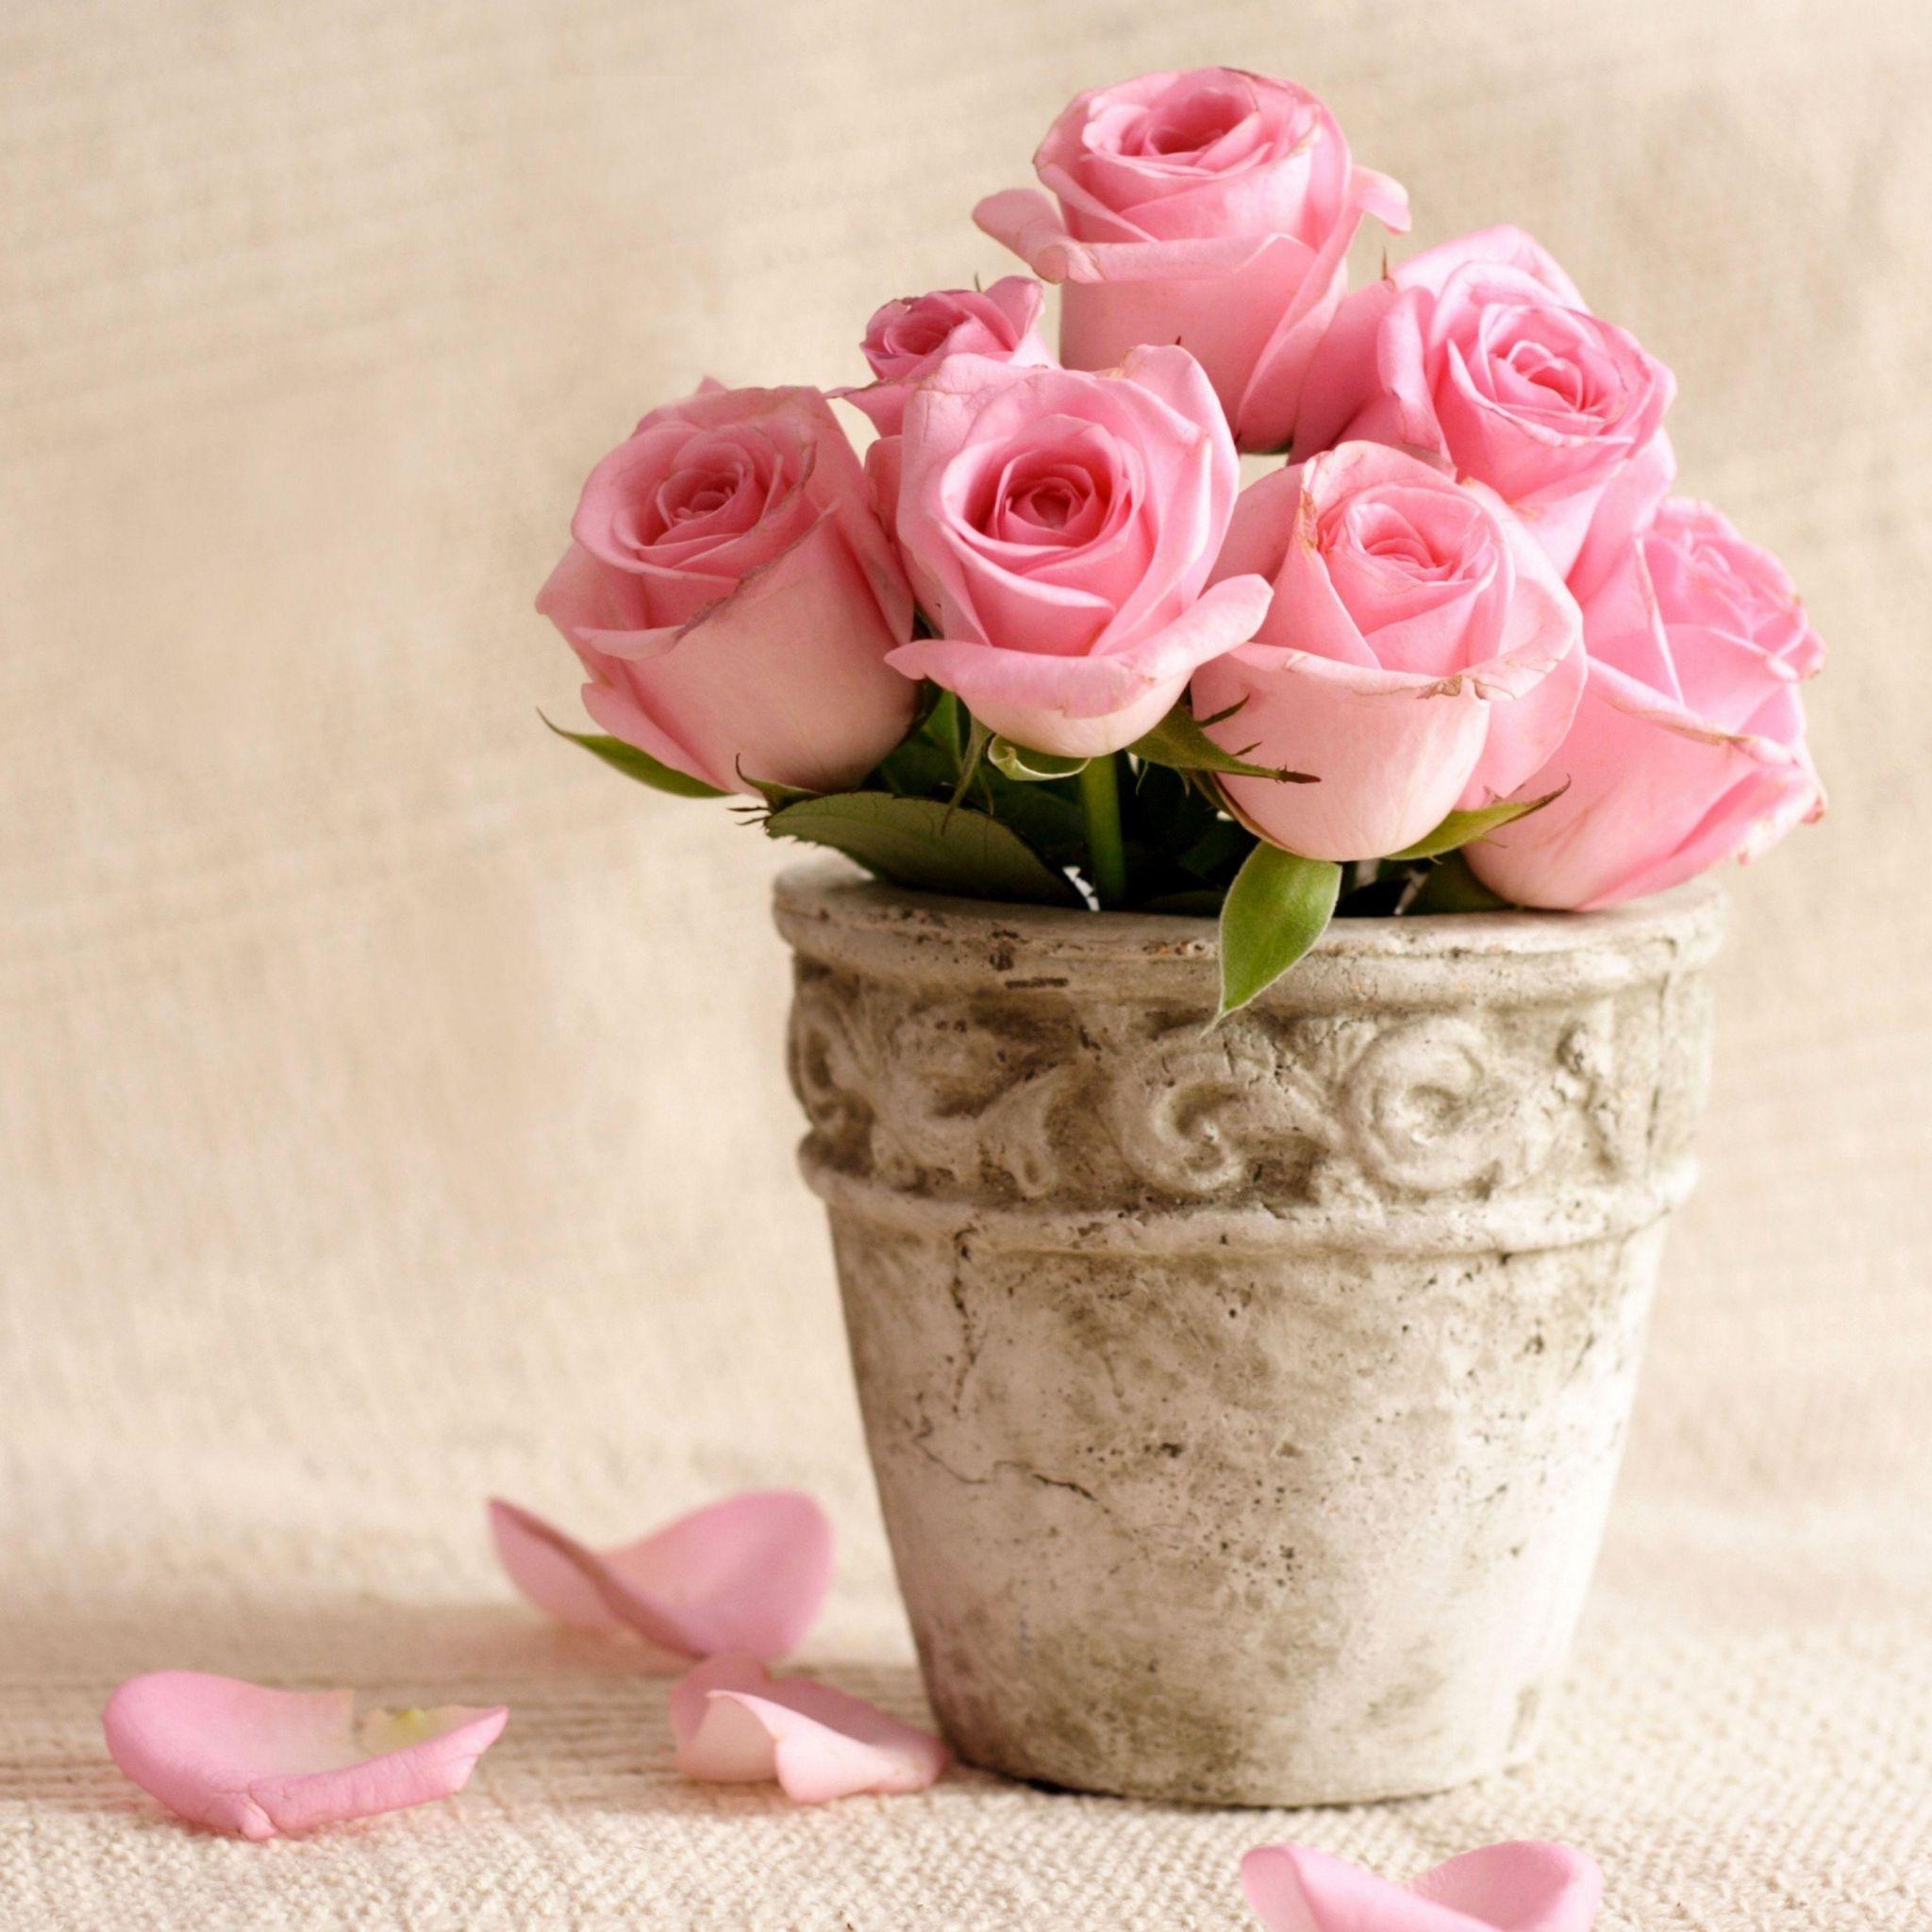 Pink Flowers Wallpaper: Download Wallpaper 2048x2048 Roses, Flowers, Pot, Petals